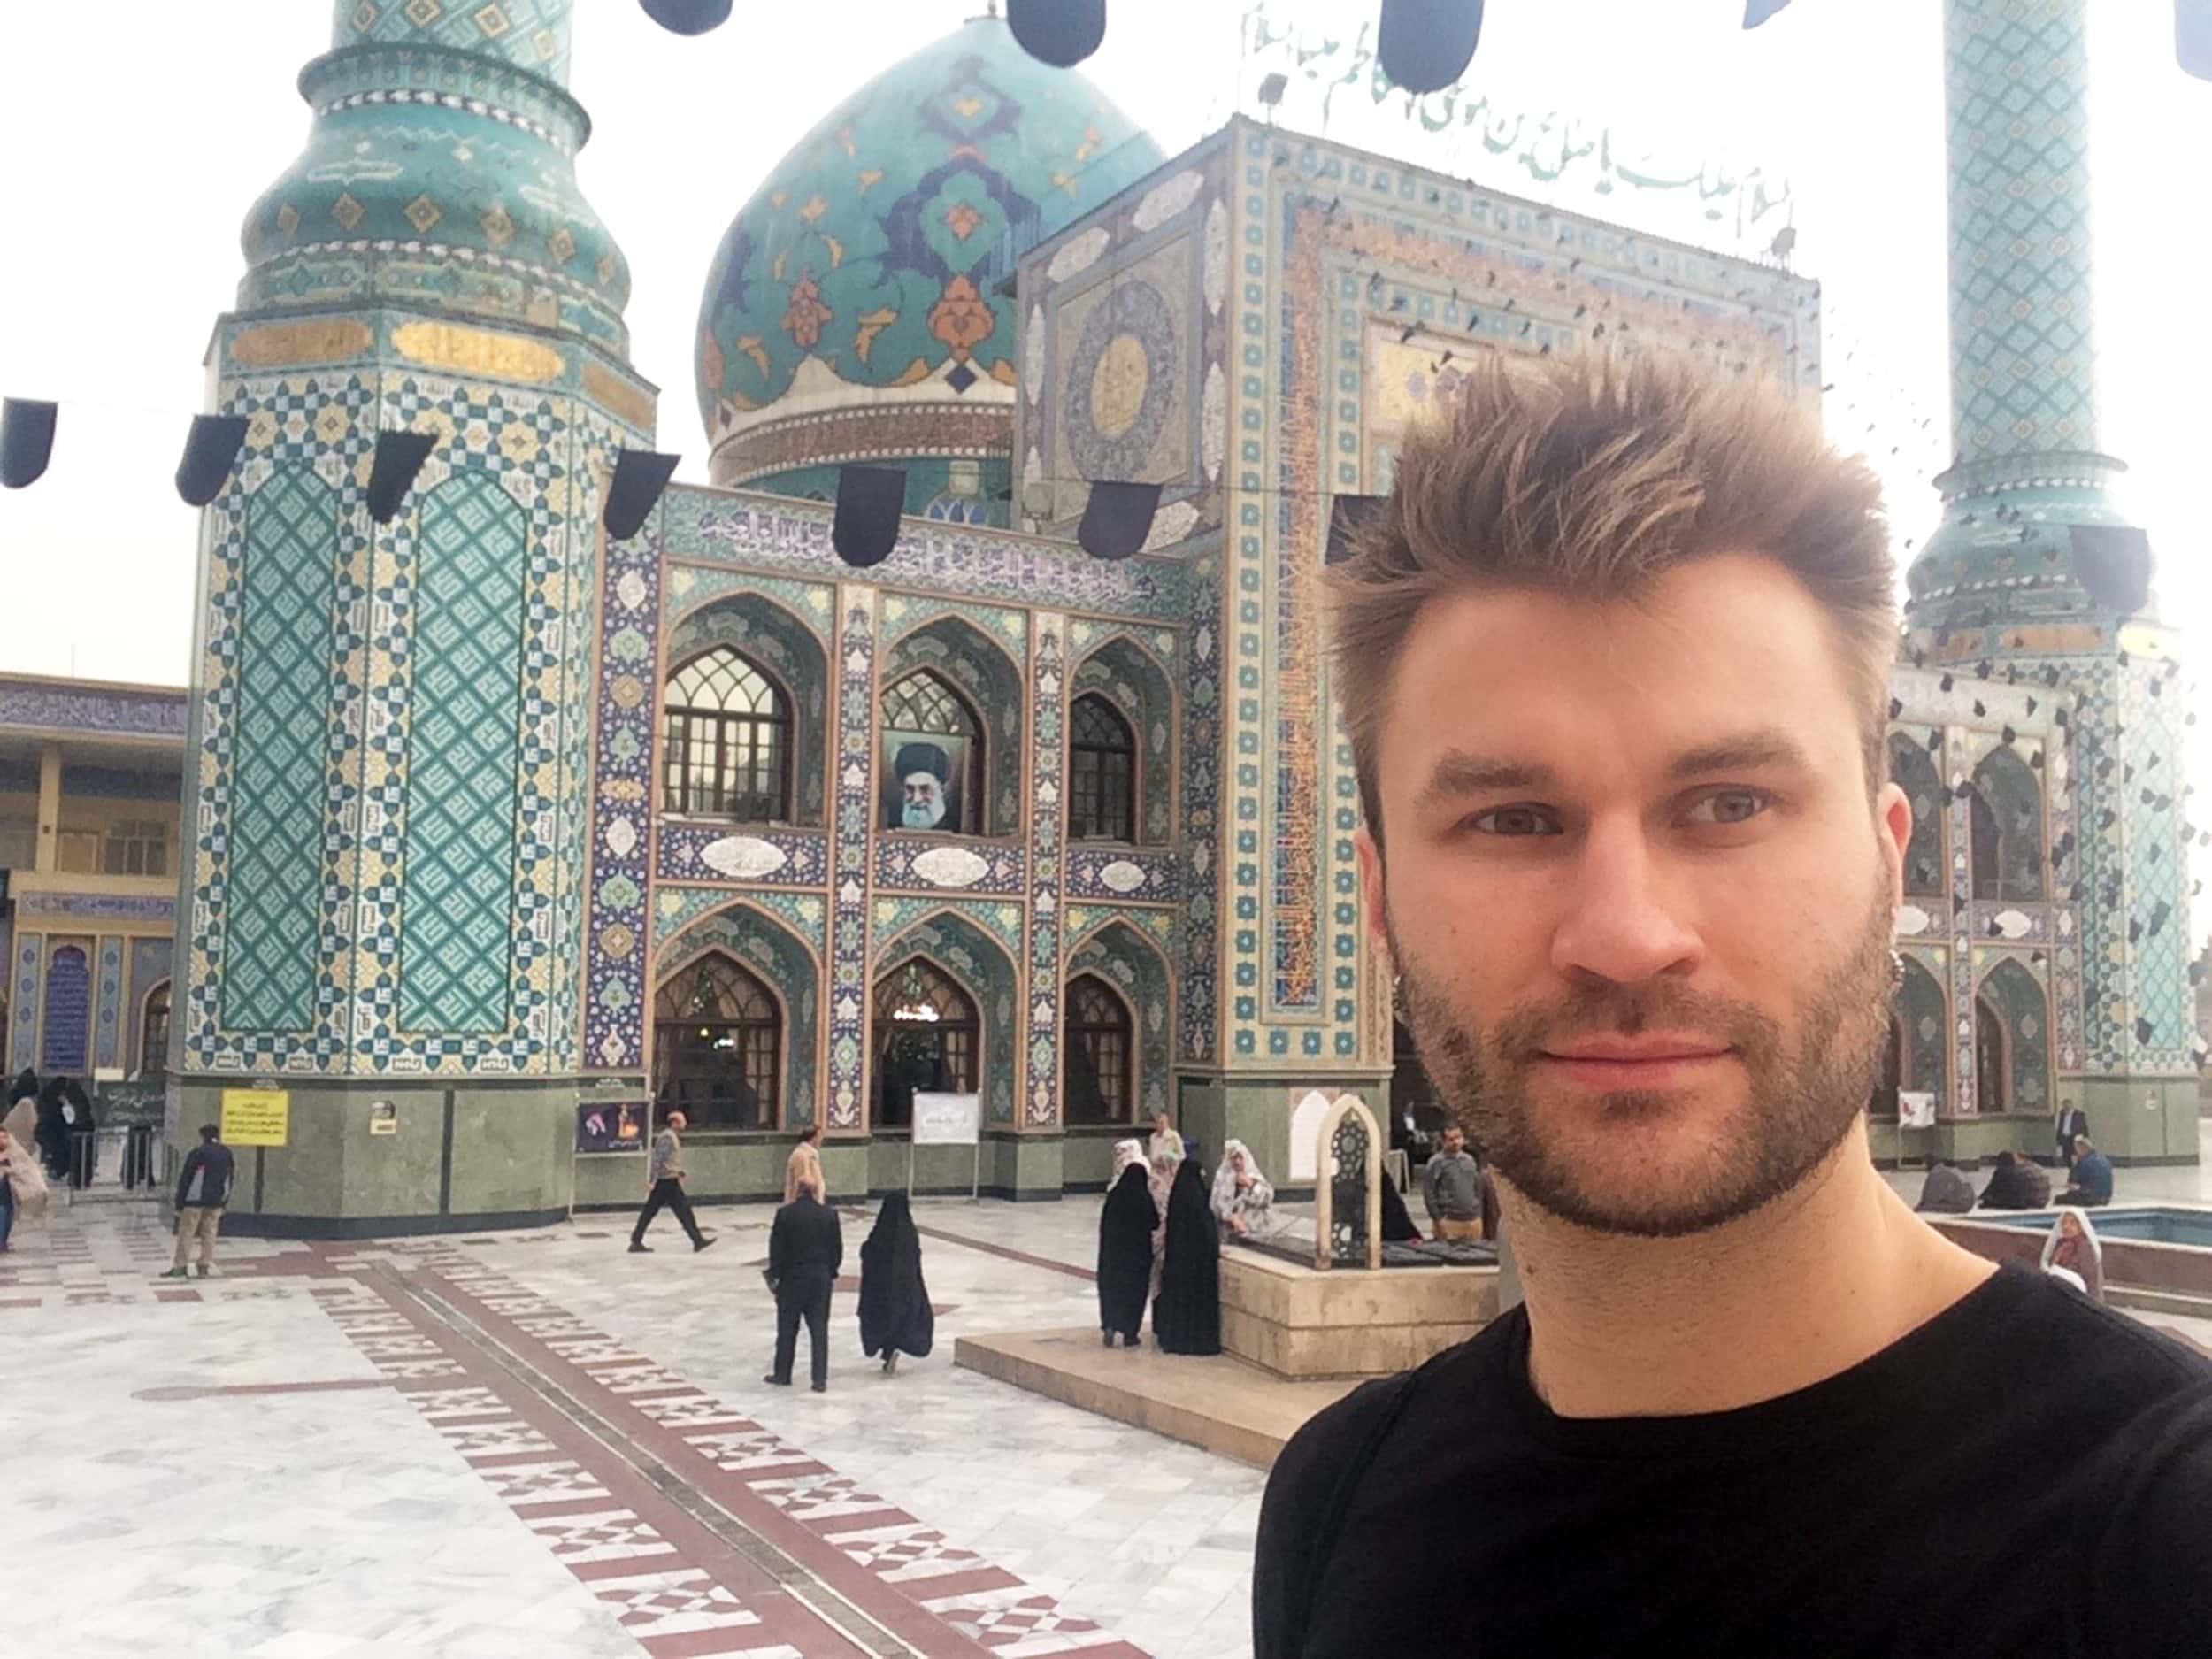 Тегеран. Мечеть. Фото 1